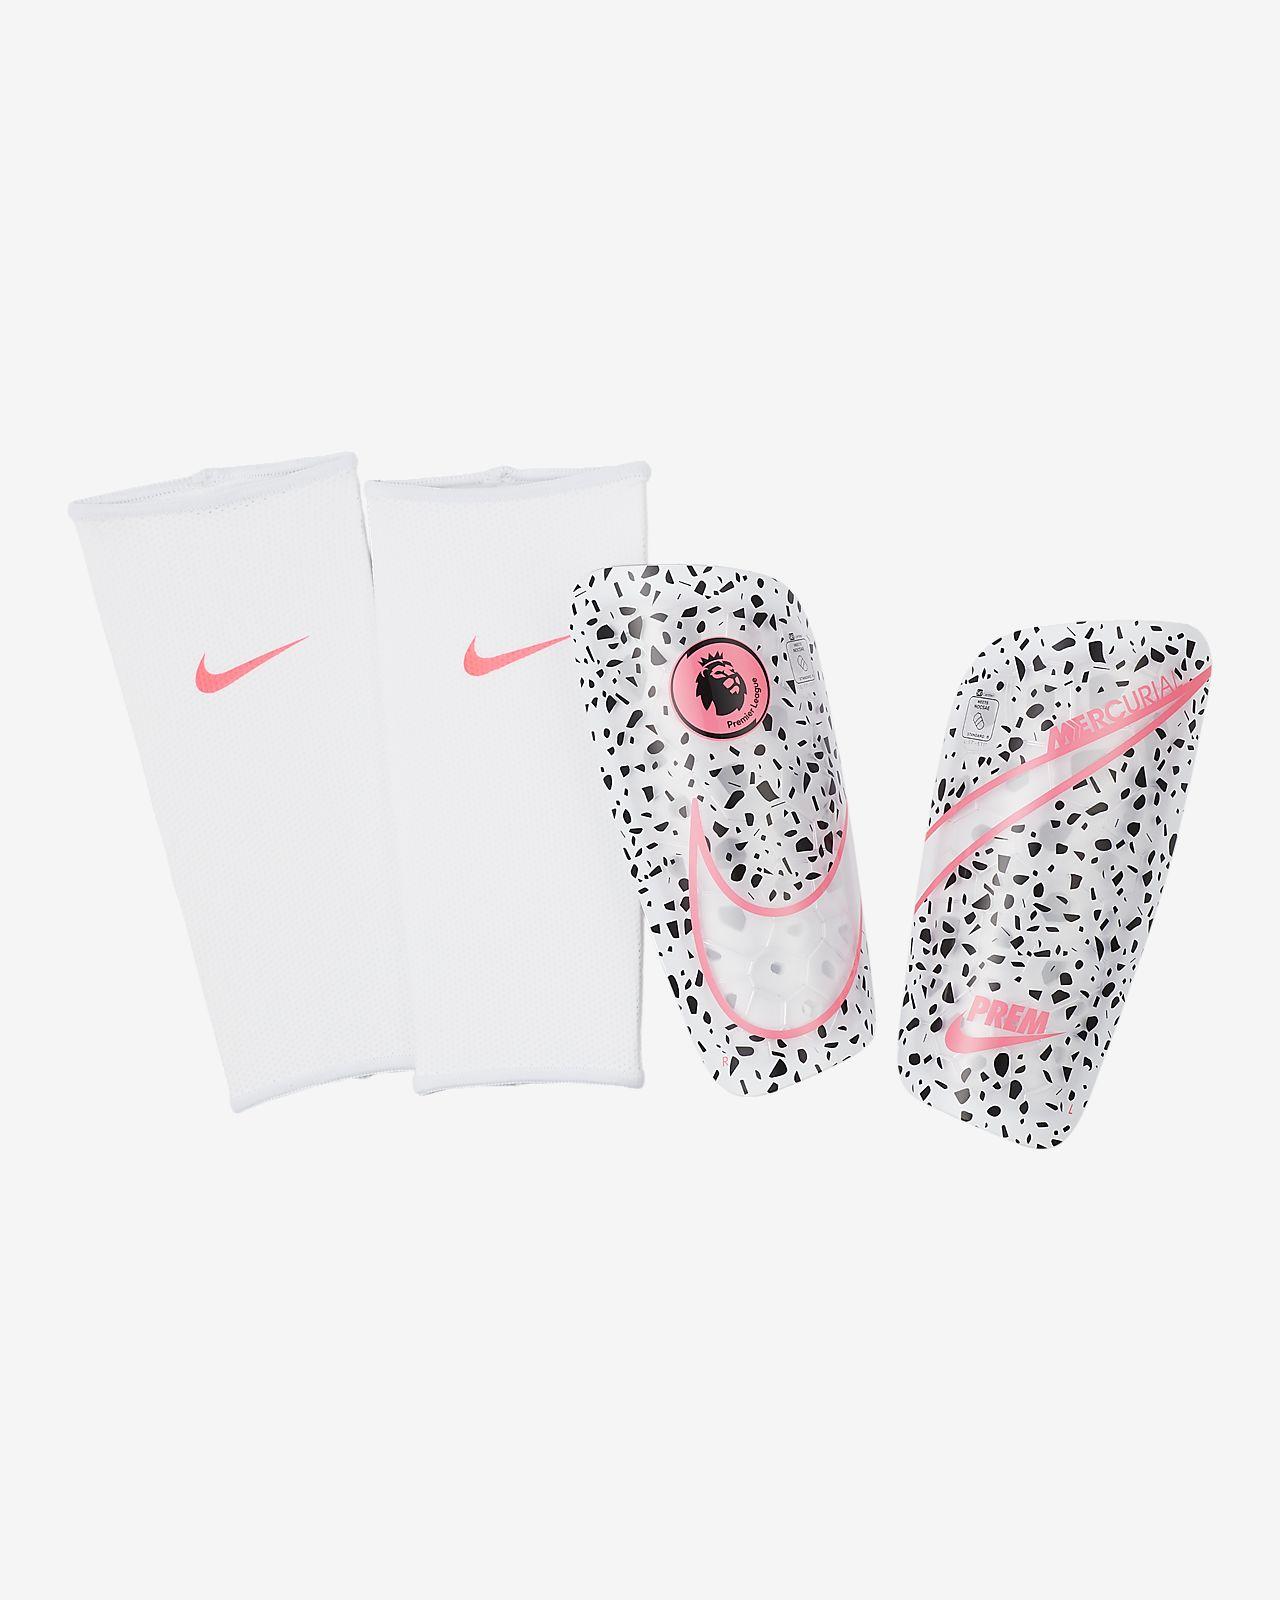 Nike Mercurial Lite Premier League Fußball-Schienbeinschoner